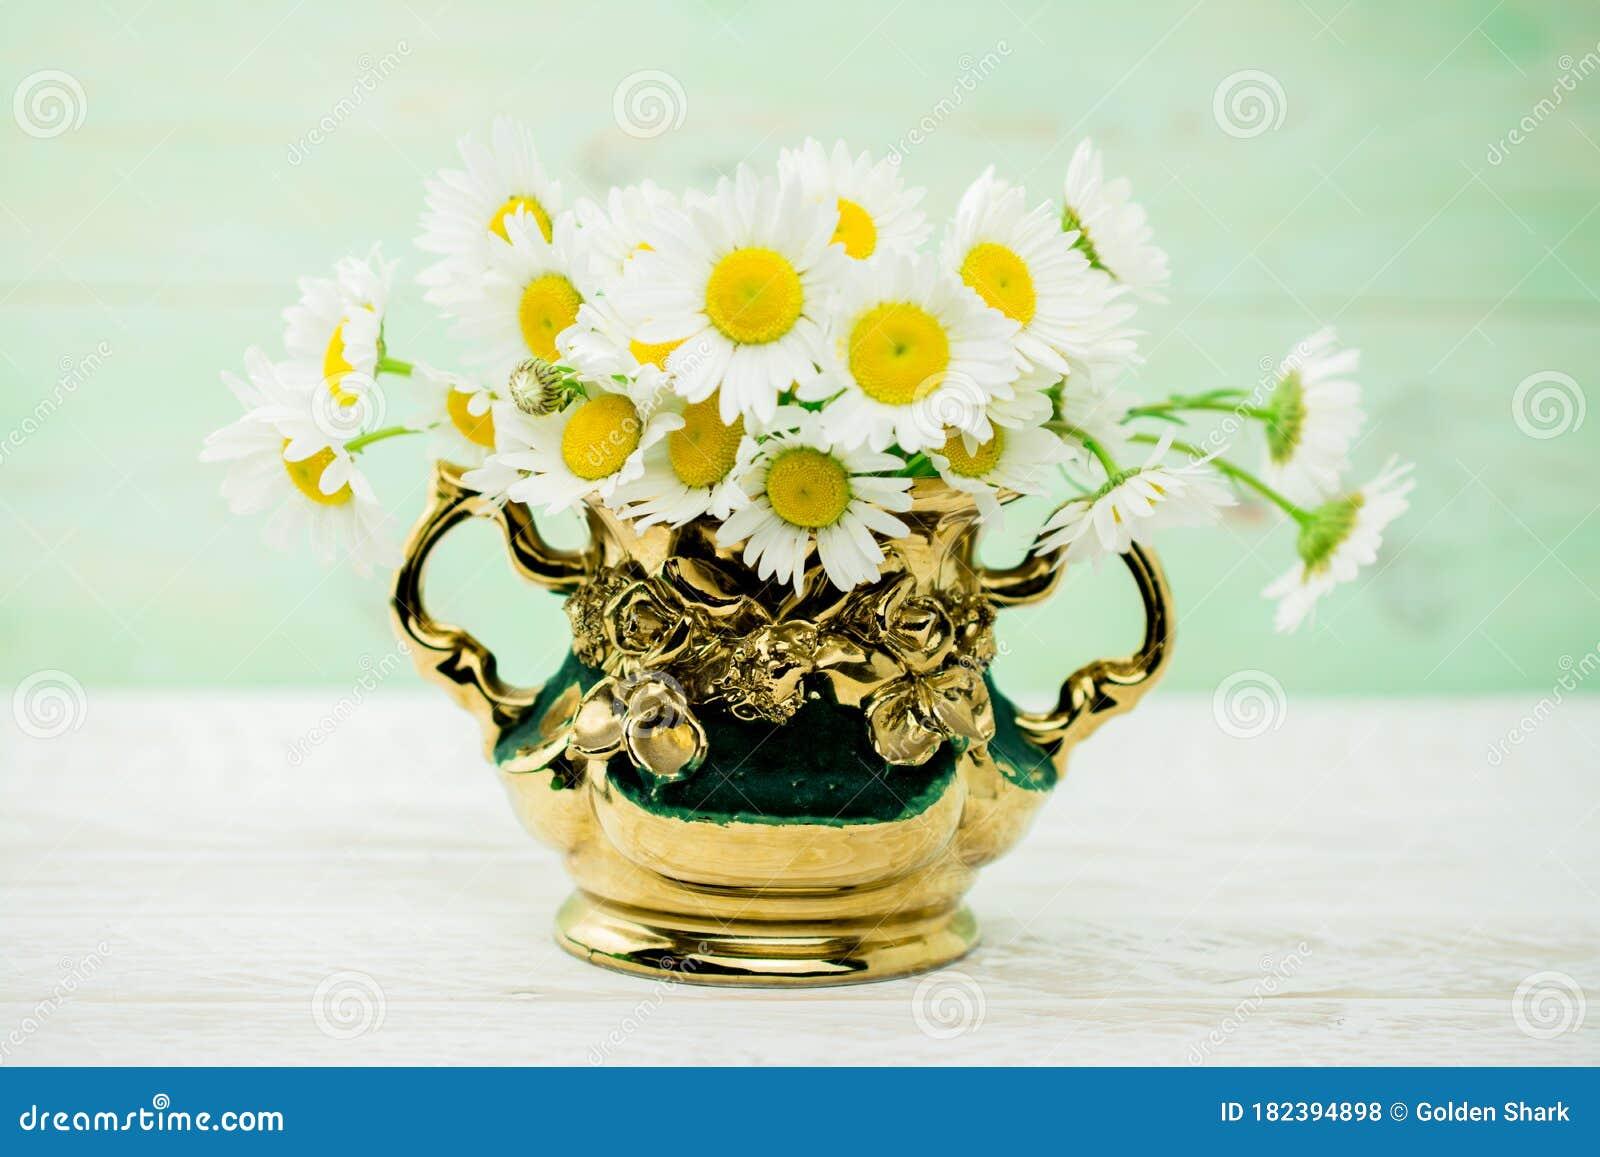 White daisy flower in vase stock photo. Image of blank ...